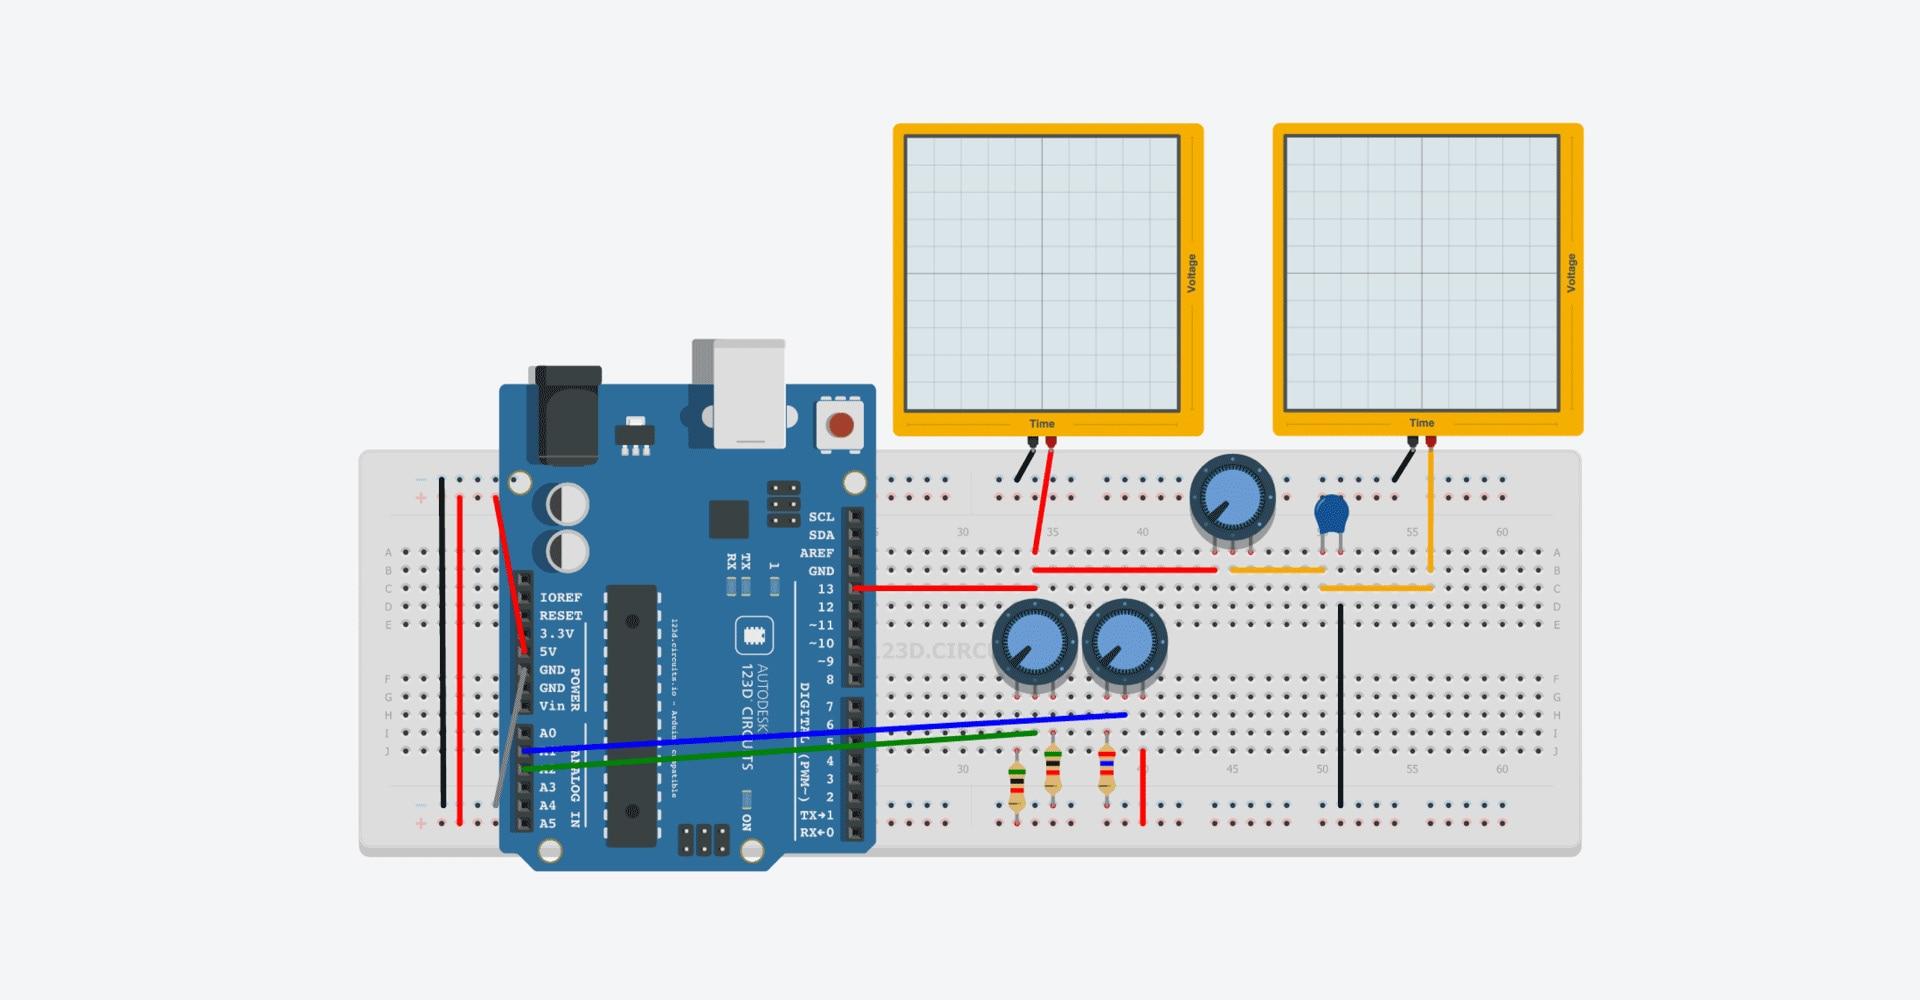 Marvelous Circuit Design Software Free Download Tutorials Autodesk Wiring Cloud Eachirenstrafr09Org